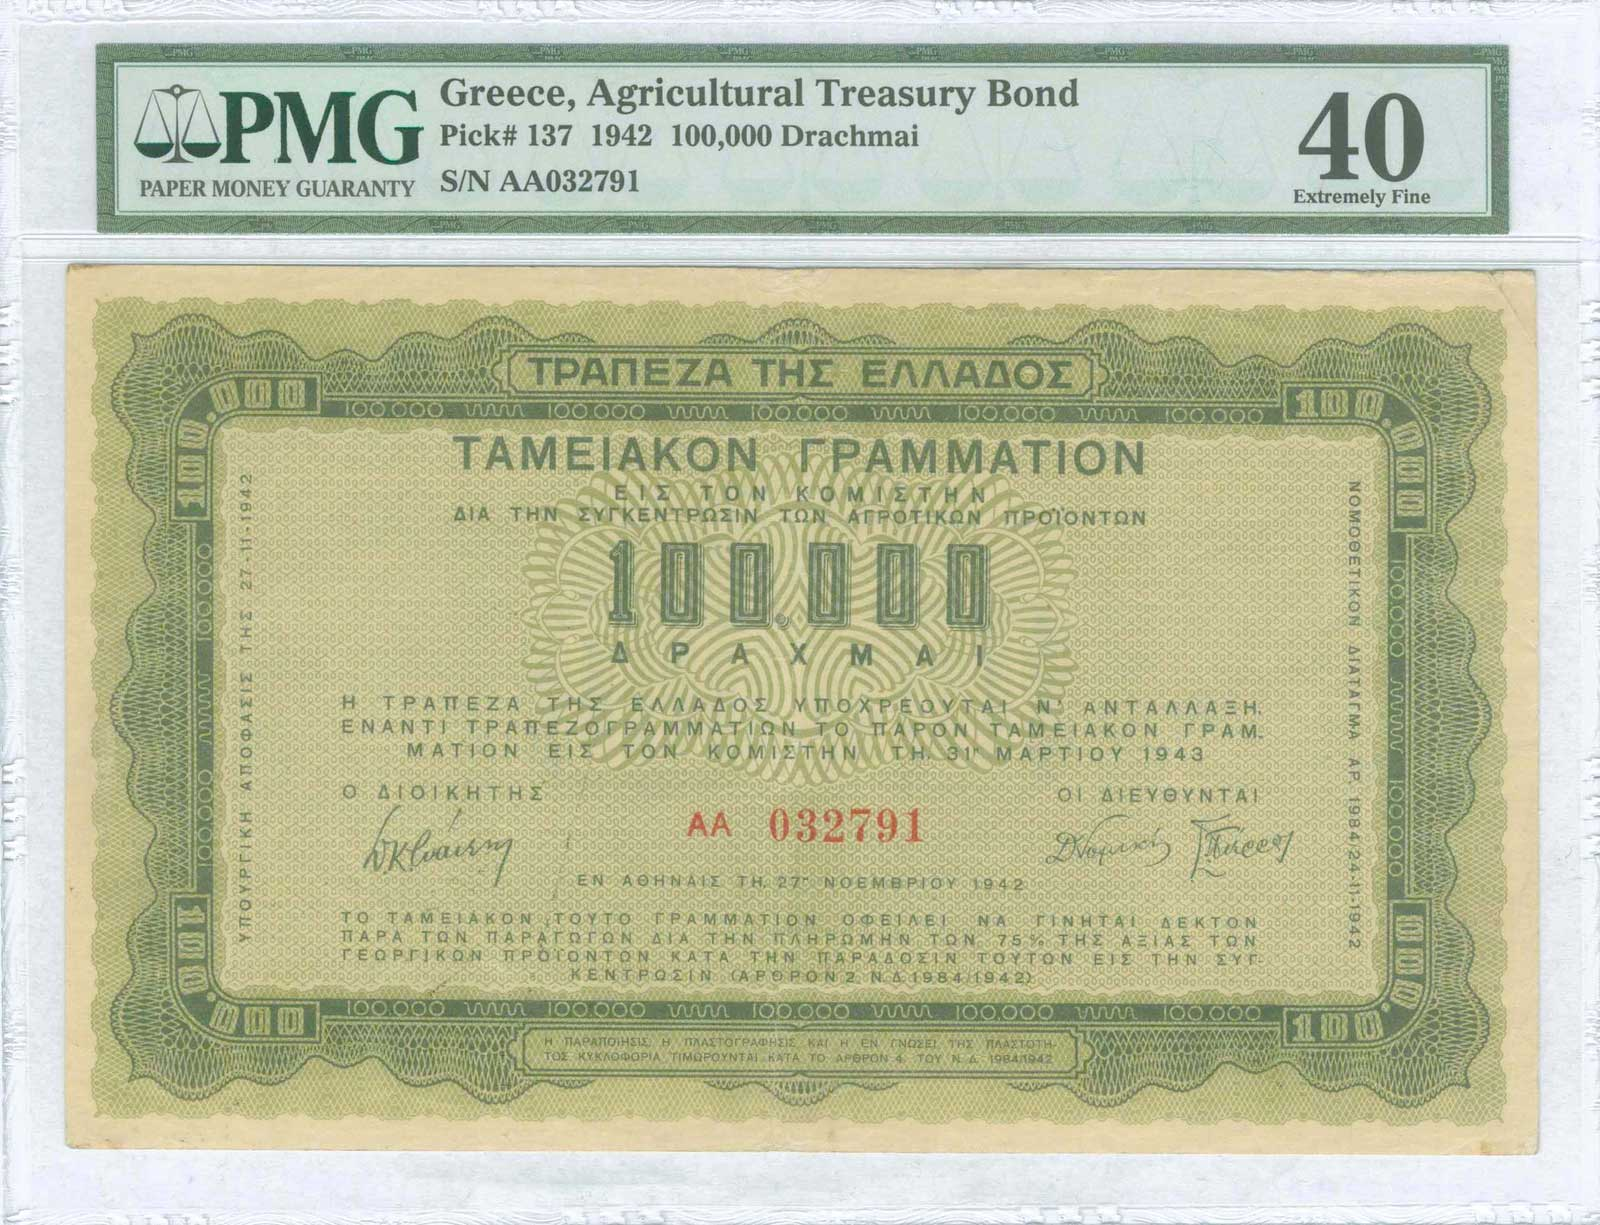 Lot 9383 - GREECE-  PAPER MONEY - BANKNOTES TREASURY BONDS & FISCAL NOTES -  A. Karamitsos Public & LIVE Bid Auction 610 Coins, Medals & Banknotes